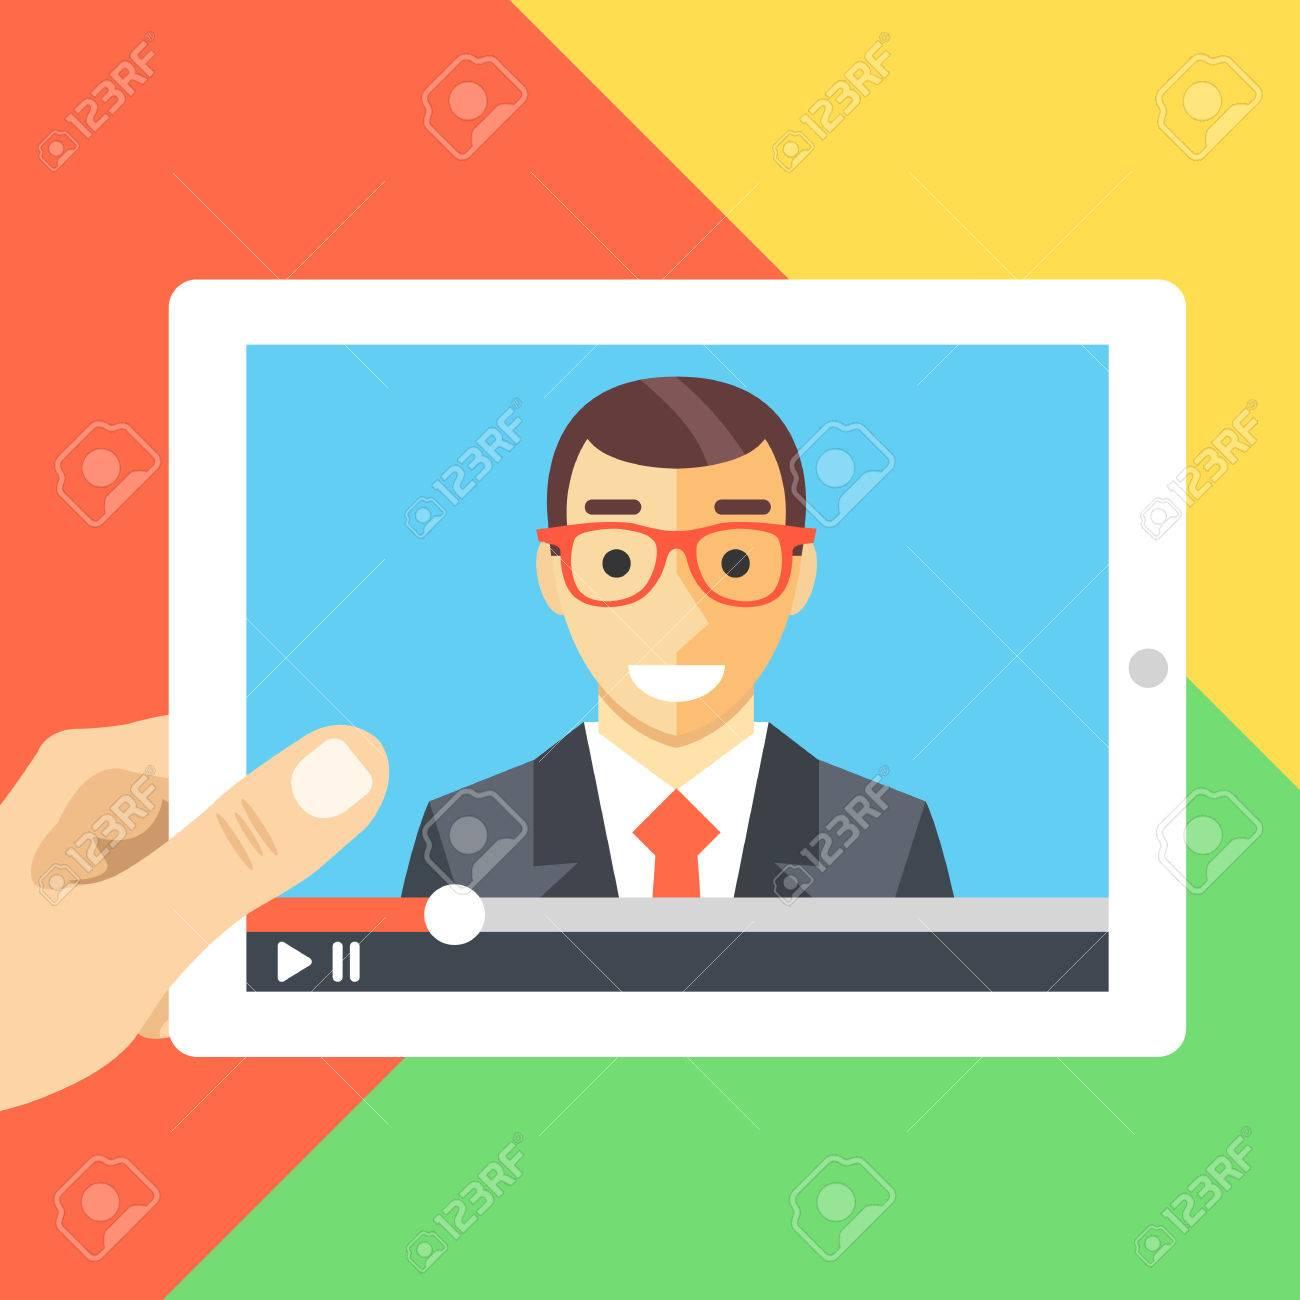 Online conference online tutorials webinar watching video online conference online tutorials webinar watching video flat illustration stock vector 52409977 baditri Gallery